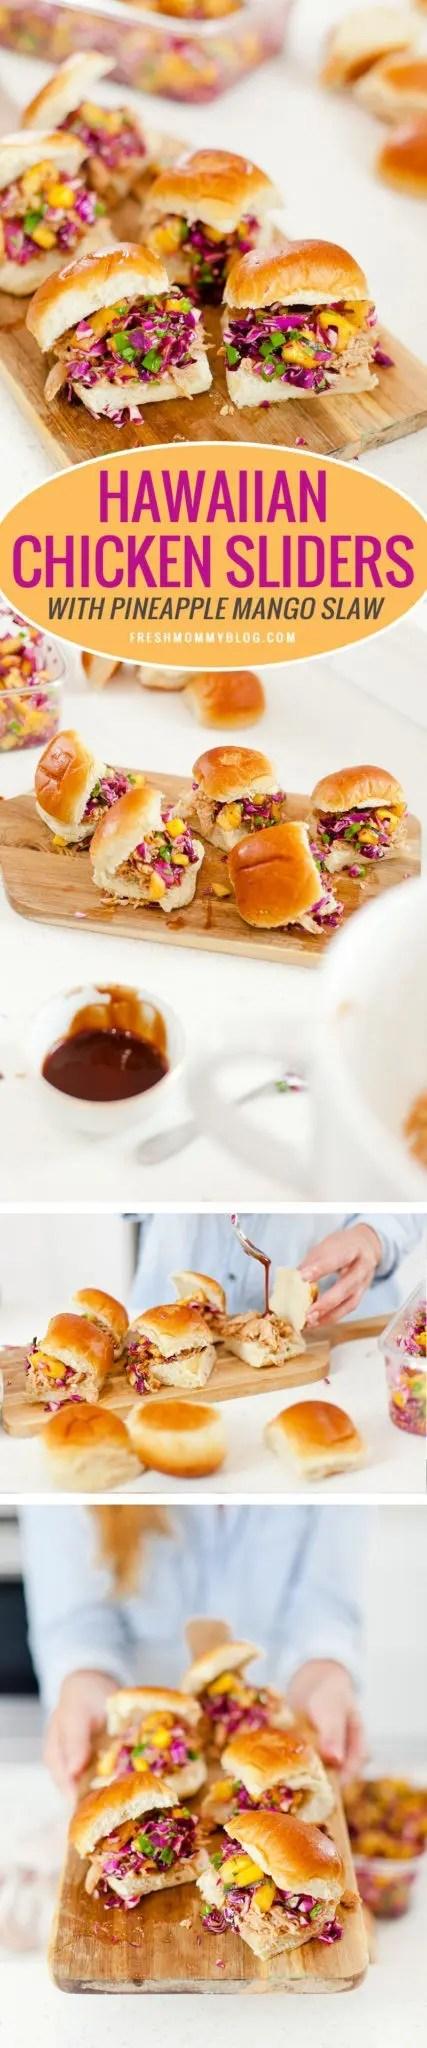 Easy Entertaining and BBQ Hawaiian Chicken Sliders with pineapple mango slaw recipe!